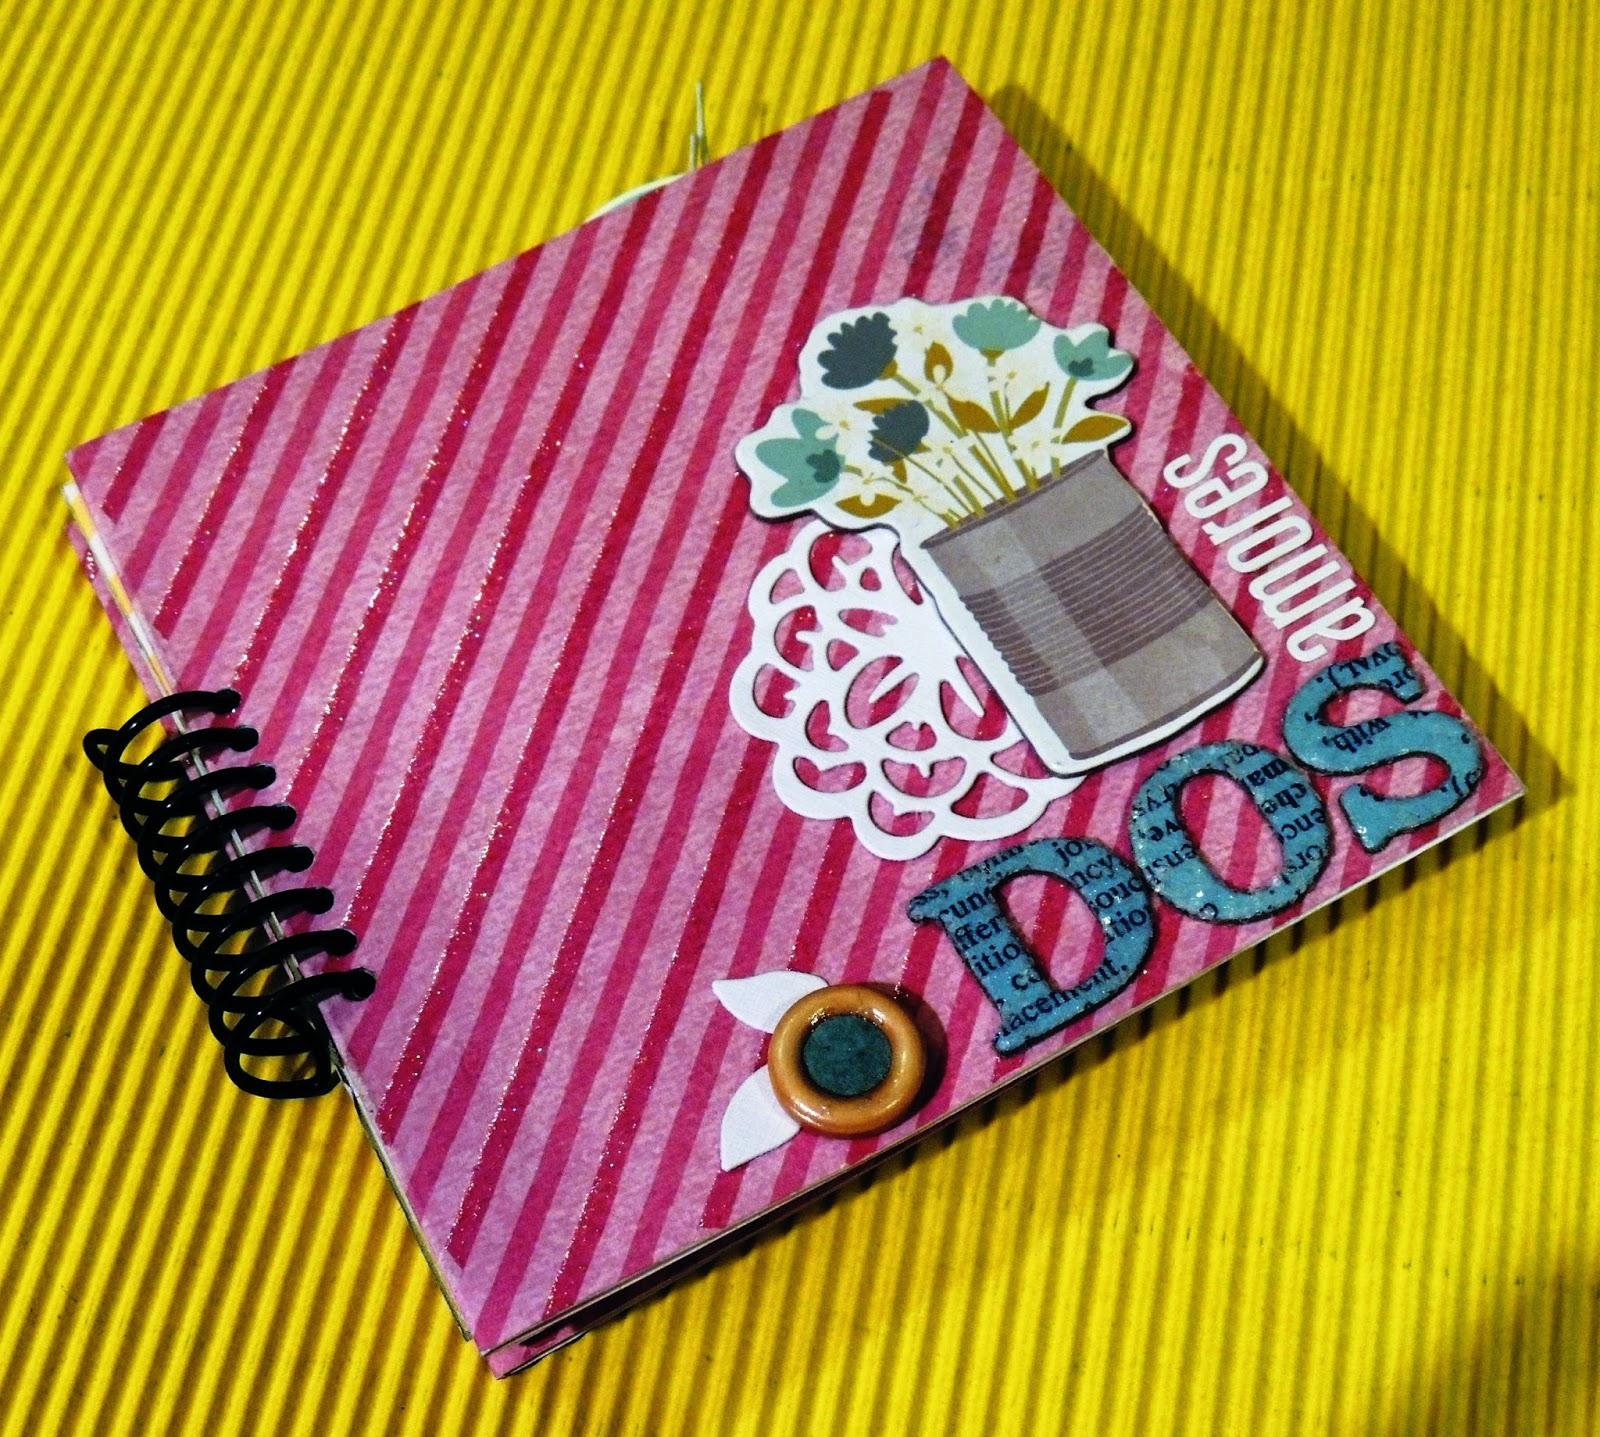 Sch tutorial mini lbum con anillado casero catalina ramirez - Manualidades album de fotos casero ...